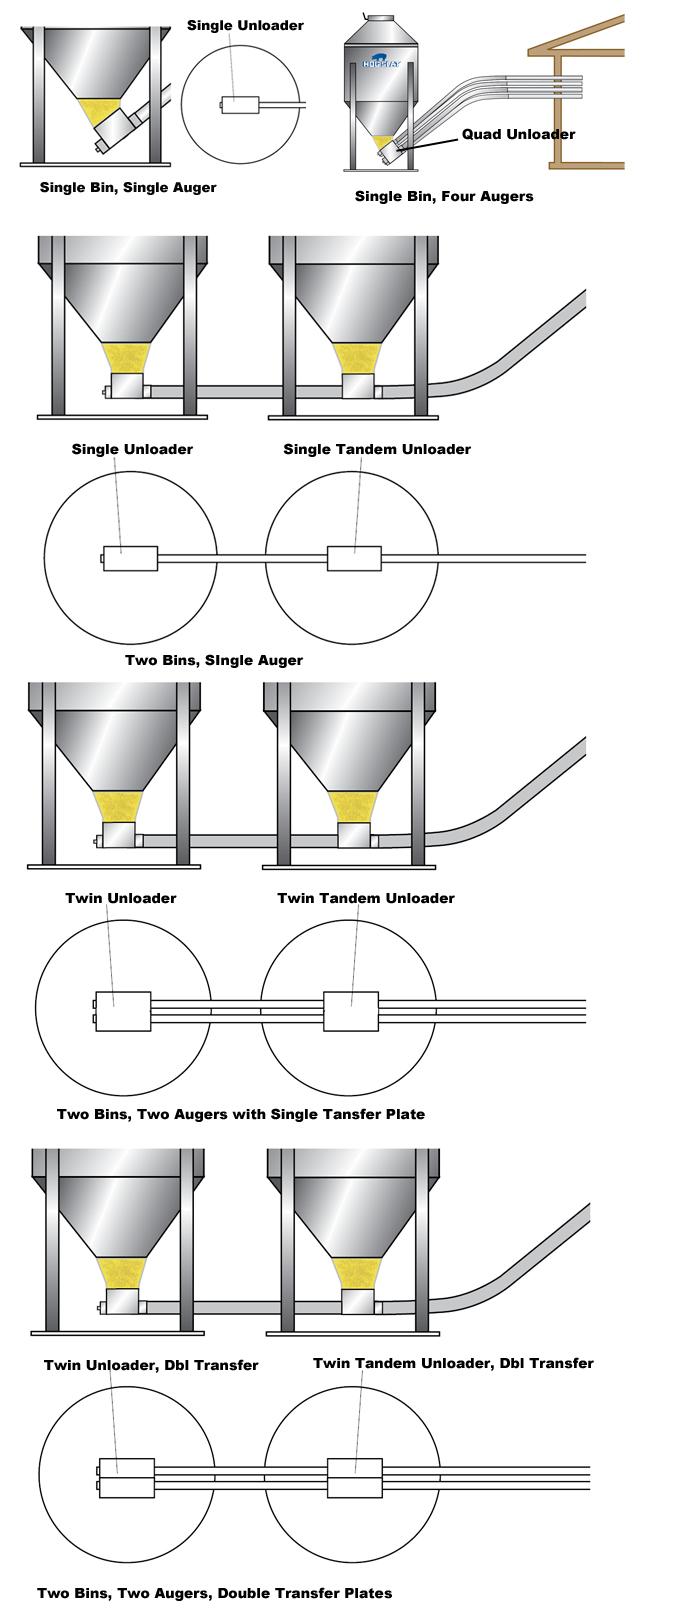 Grower Select® unloader diagrams